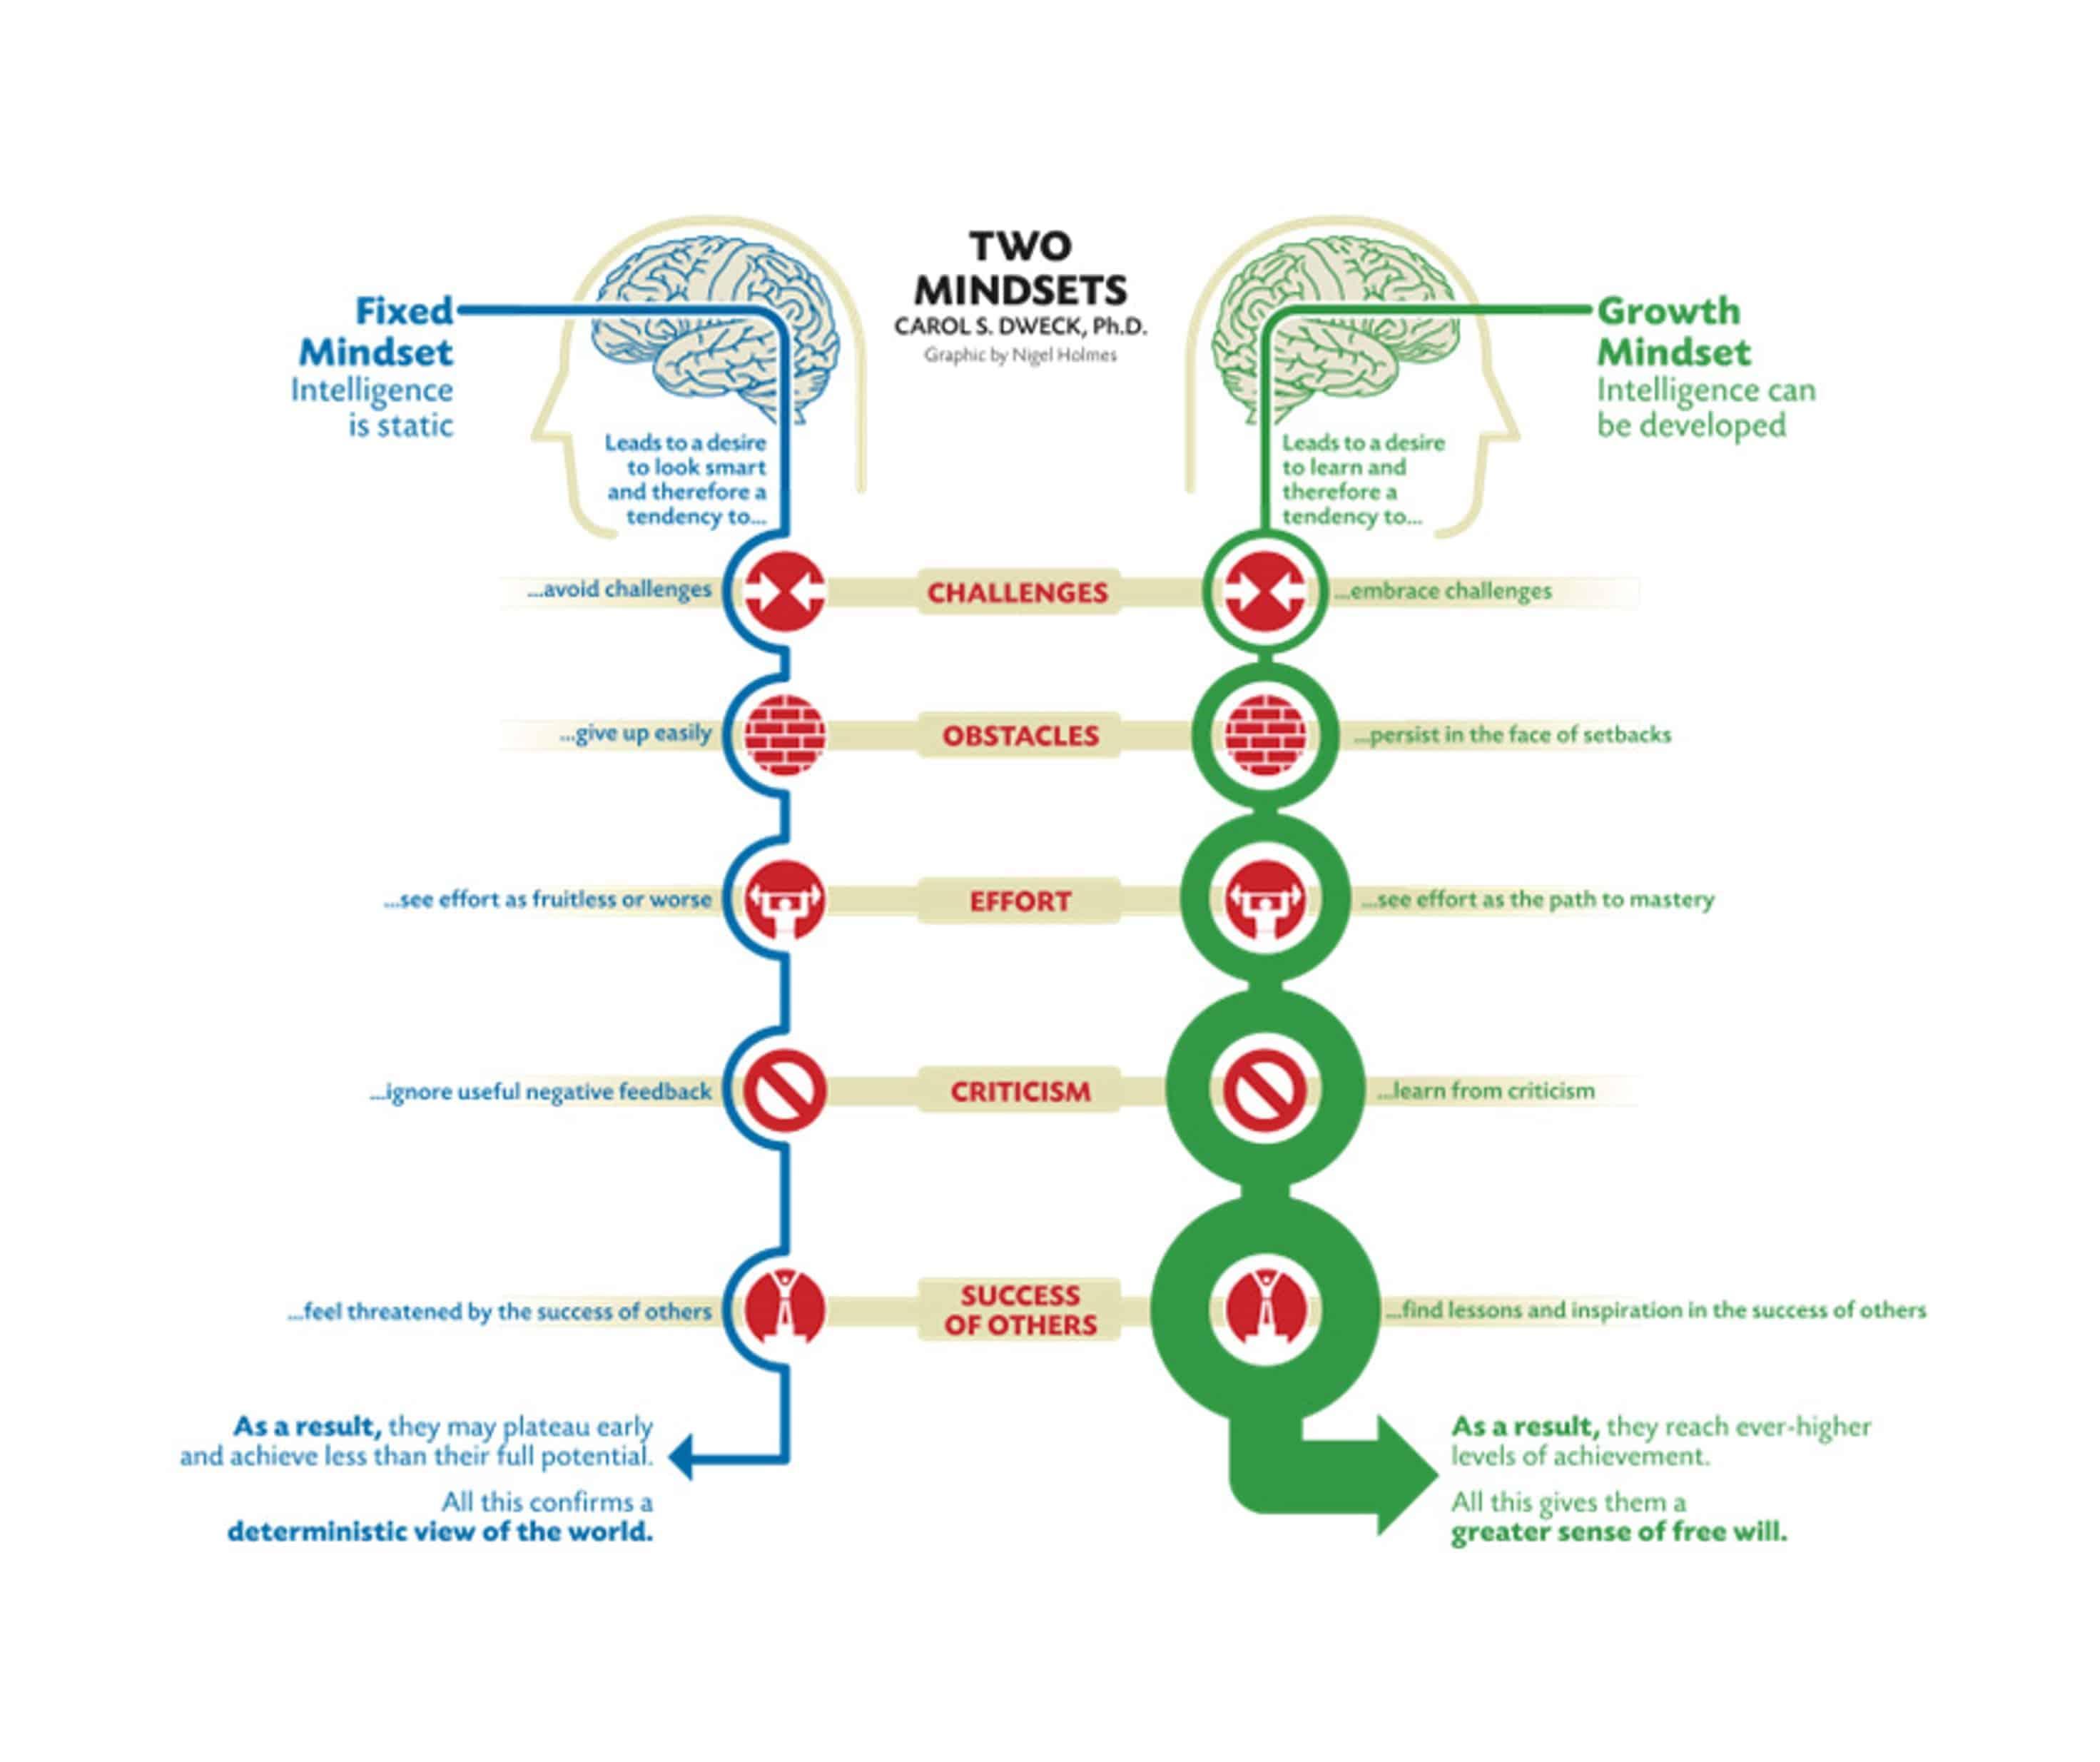 employee development means having a growth mindset like Carol Dweck's approach